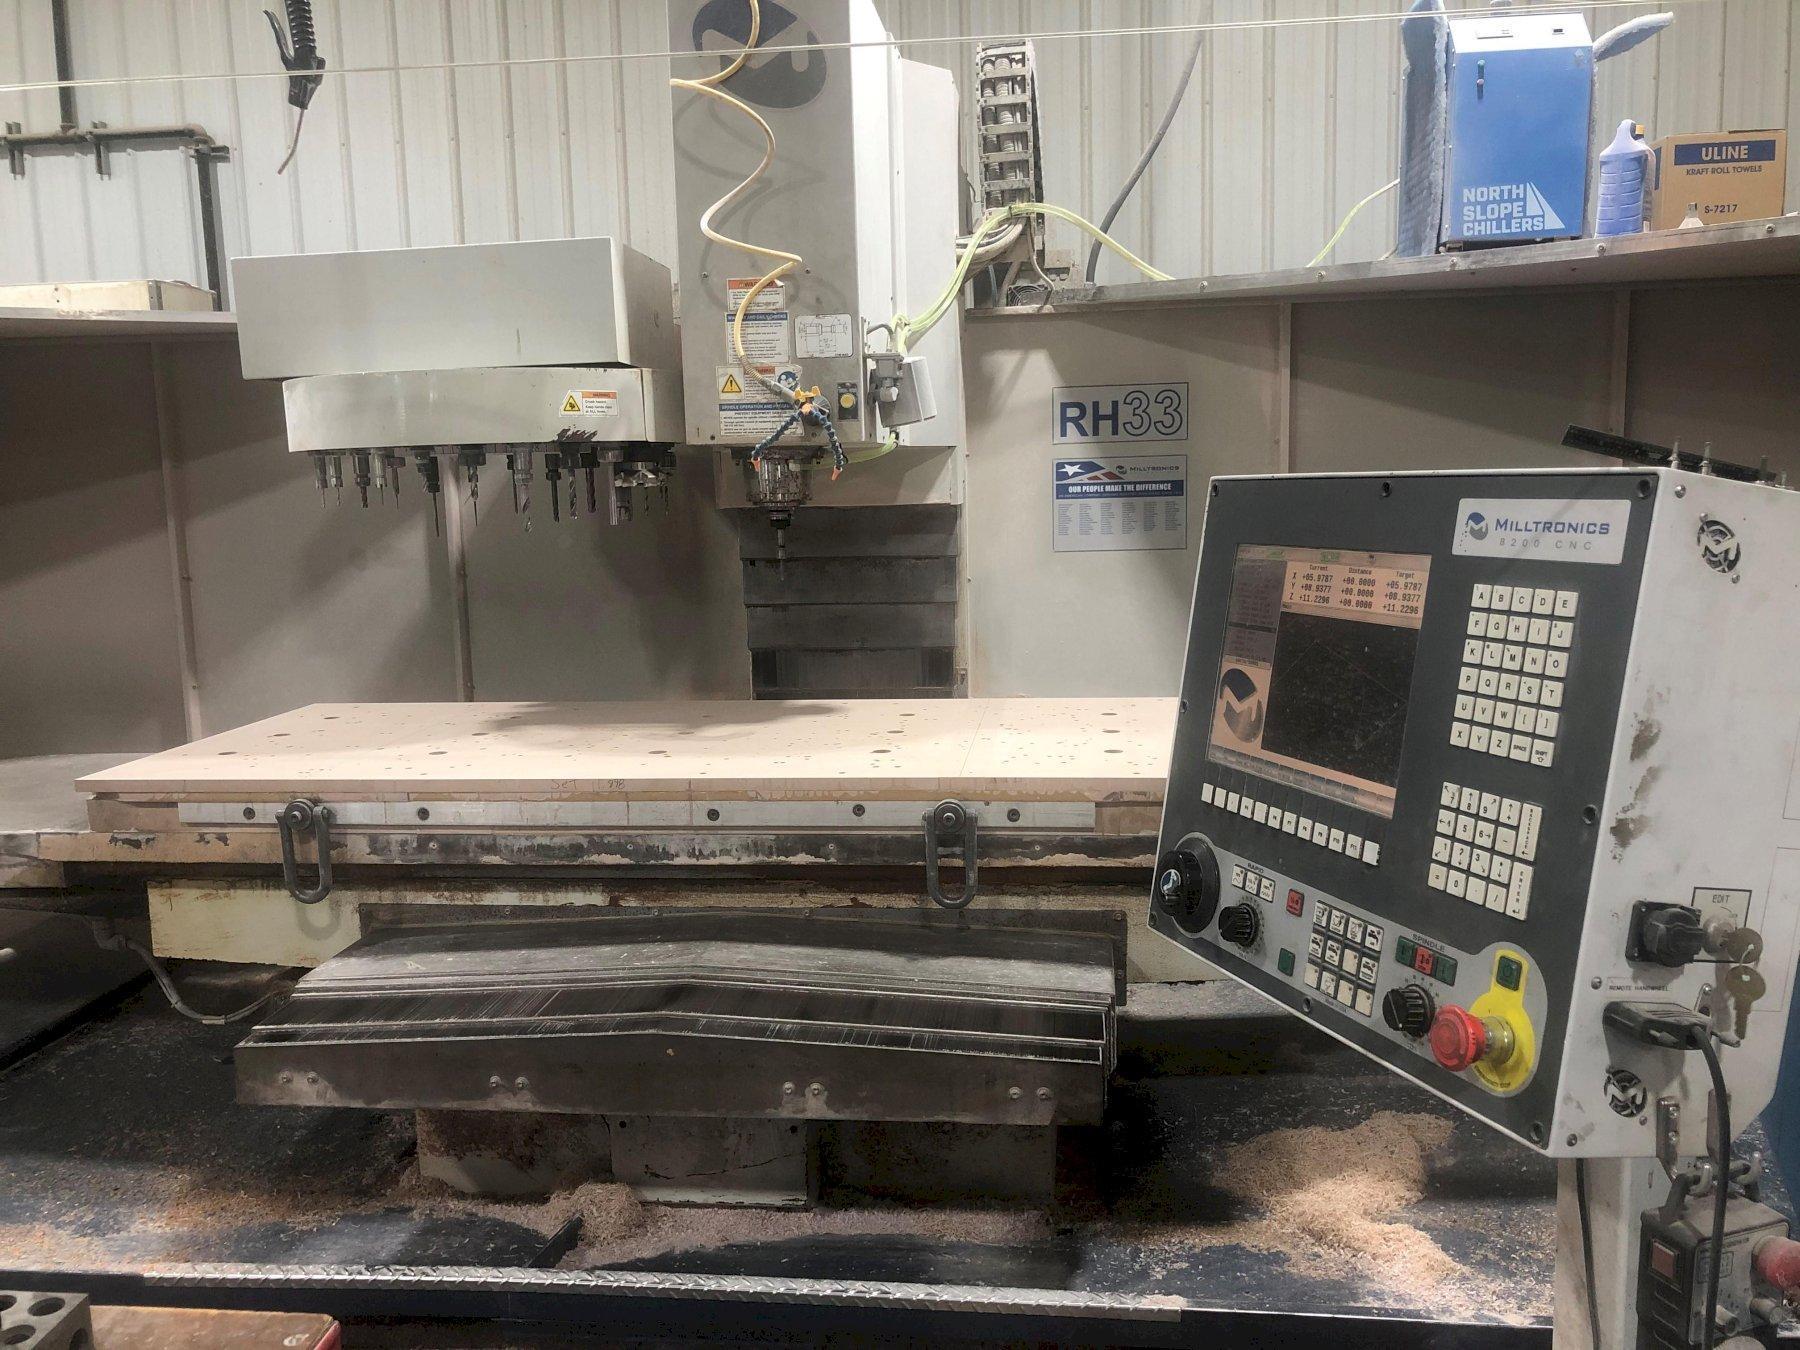 MILLTRONICS Model RH33 CNC Vertical Bed Mill / Machining Center, New 2013.